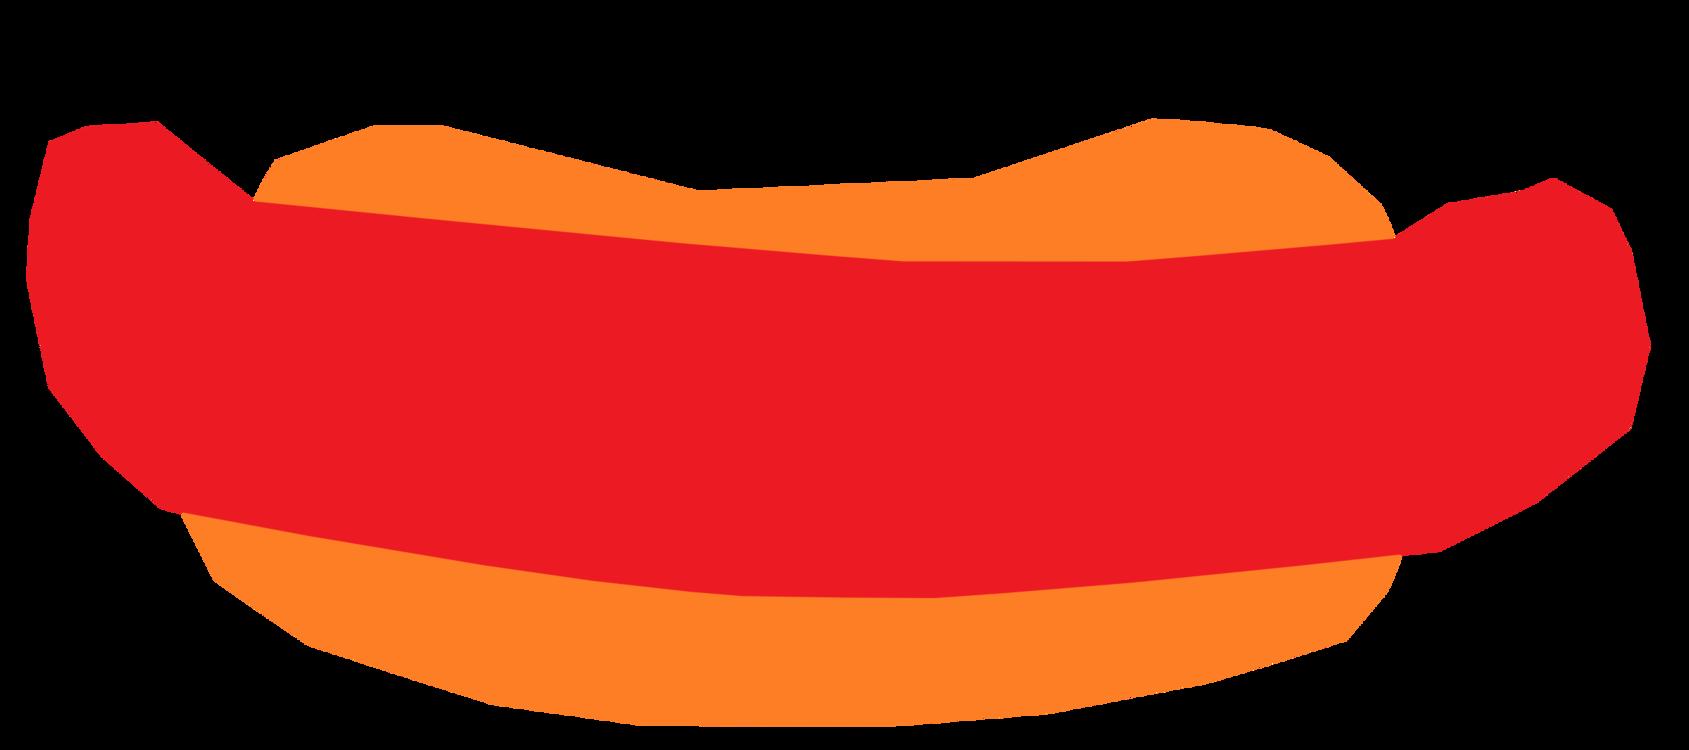 Angle,Peach,Food